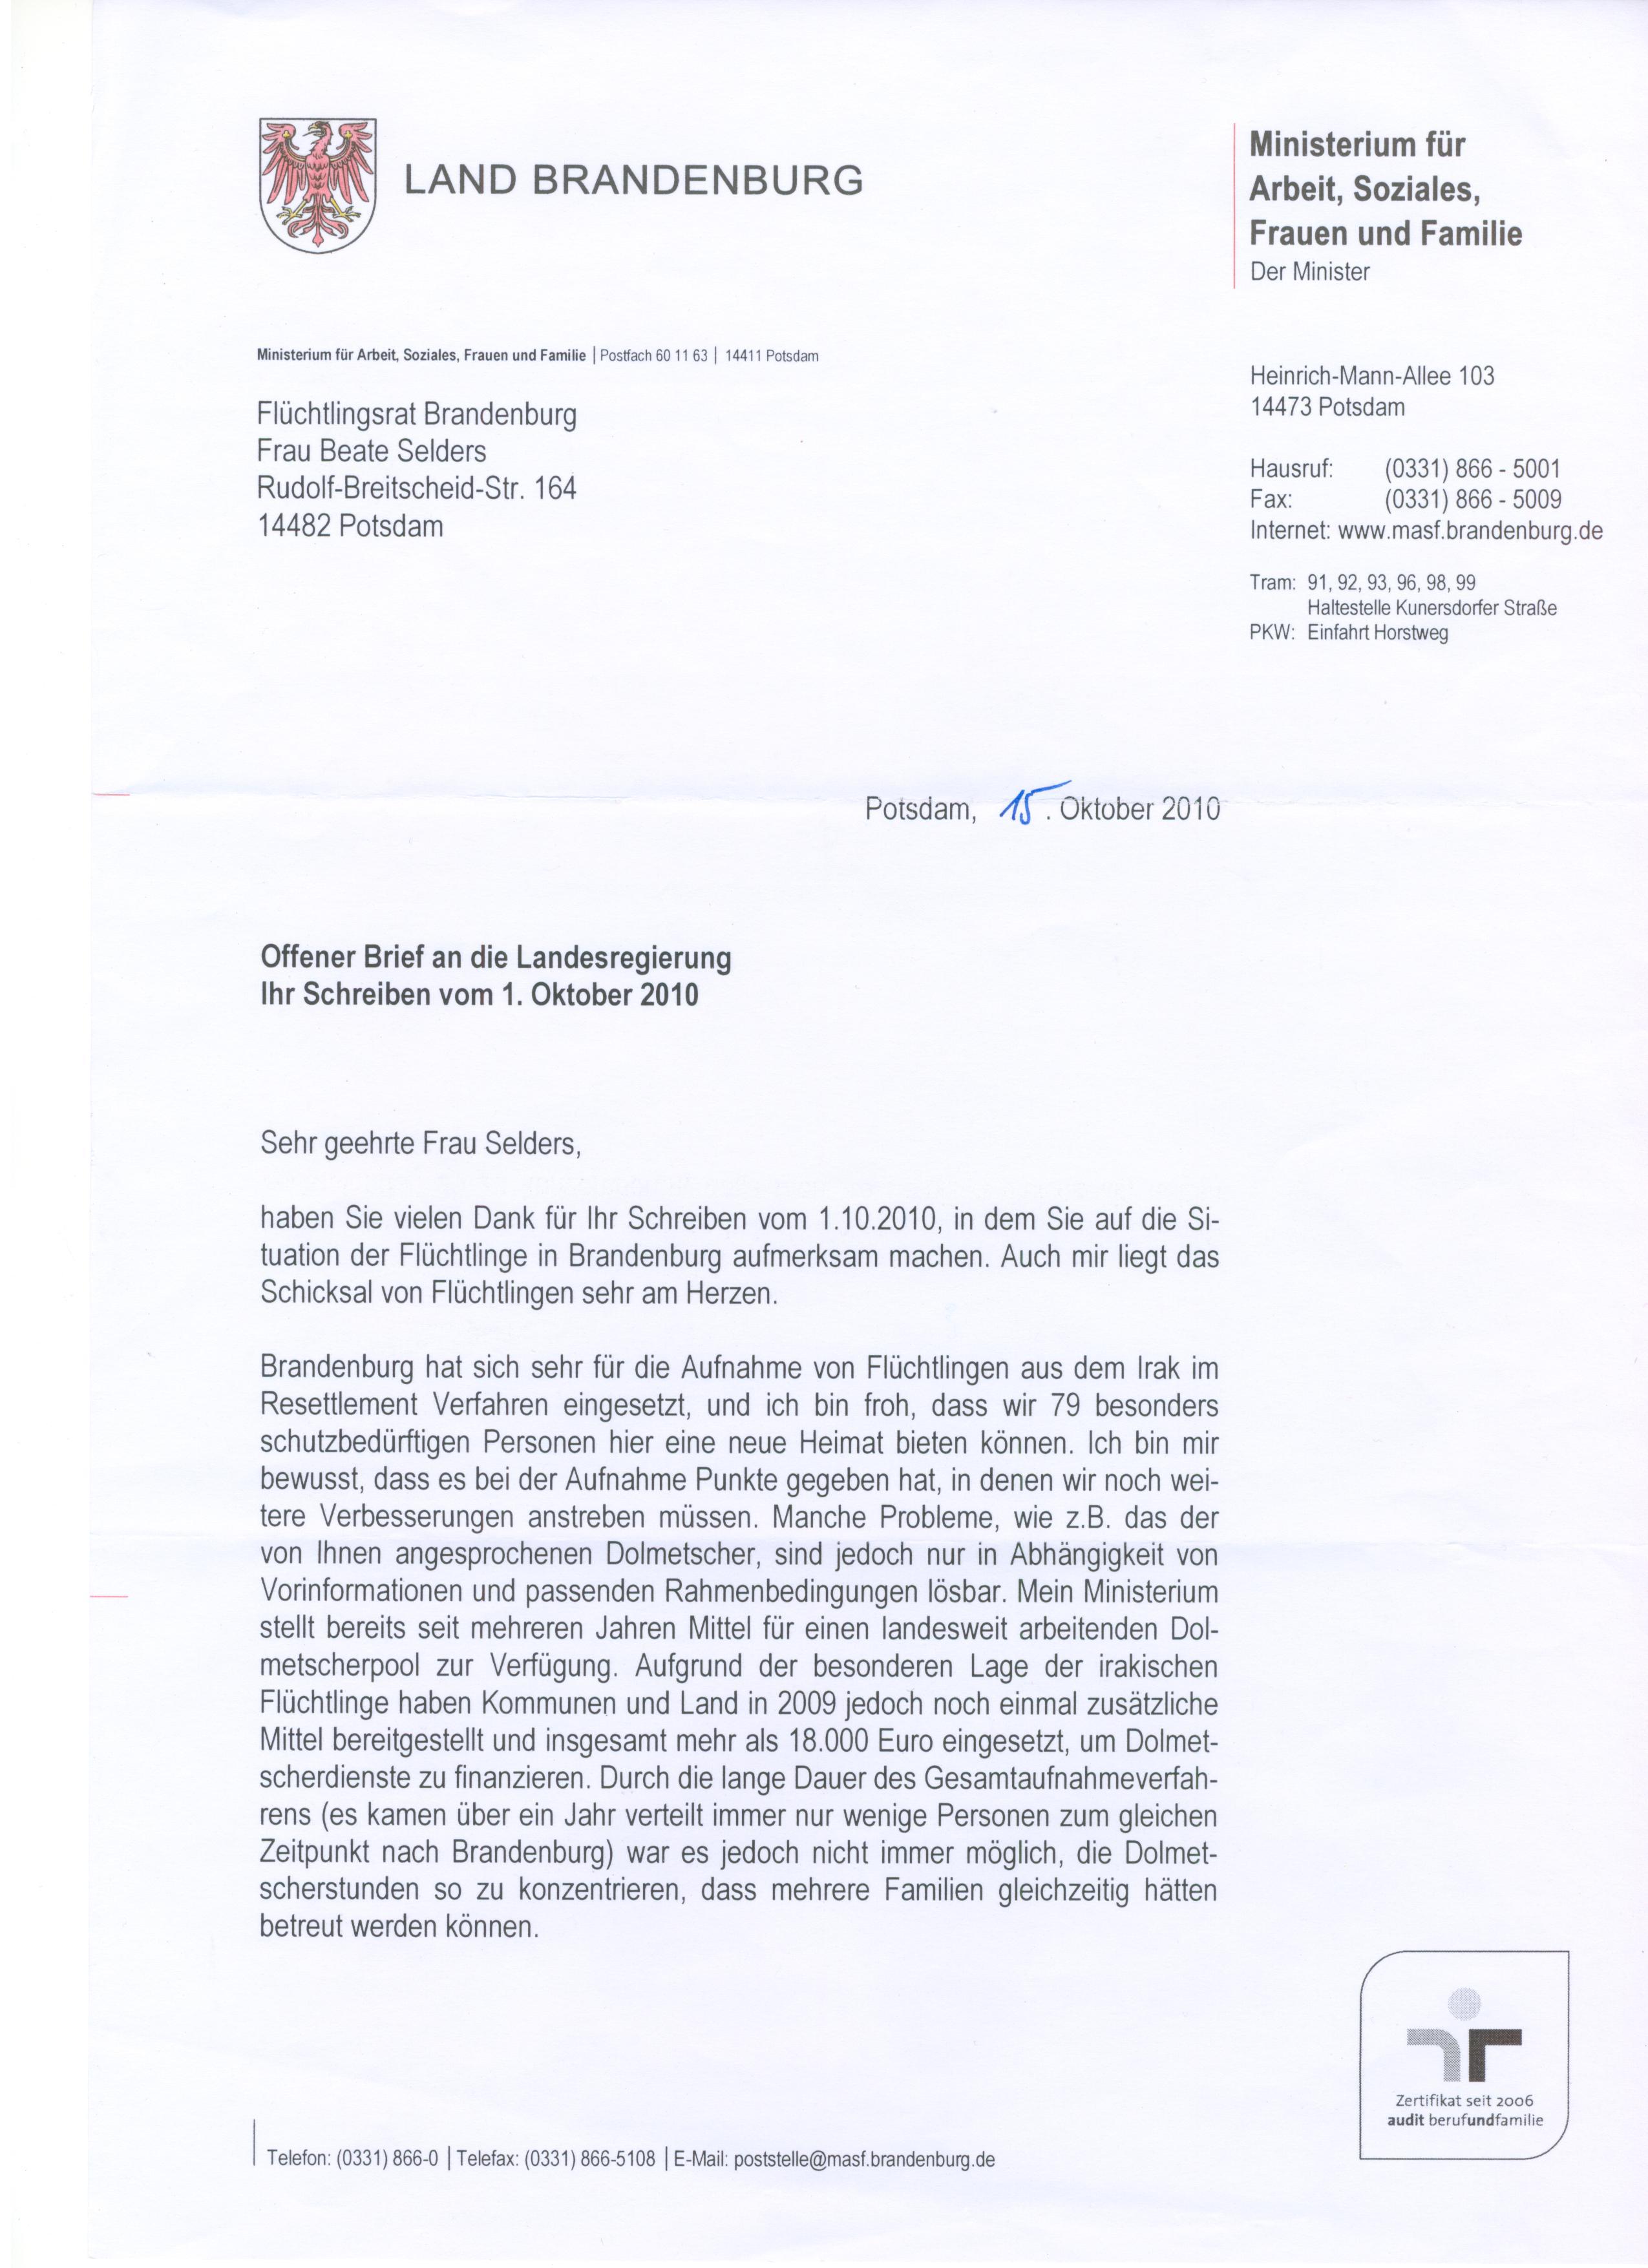 Resettlement Offener Brief An Die Landesregierung Flüchtlingsrat